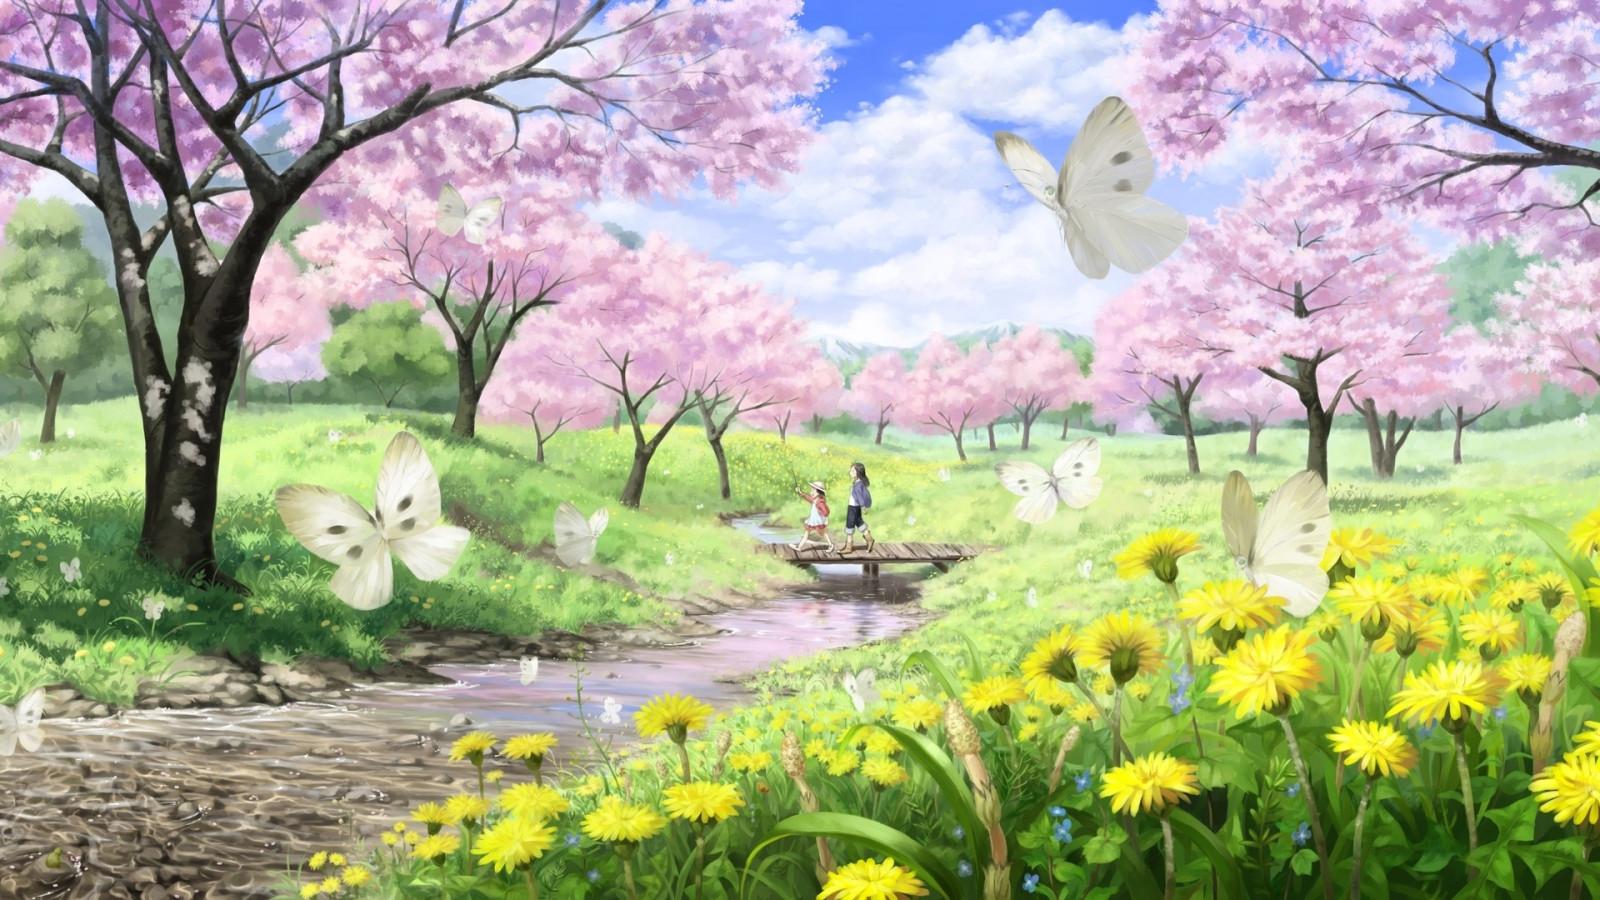 Wallpaper Bunga Sakura Animasi Mekar Menanam Flora